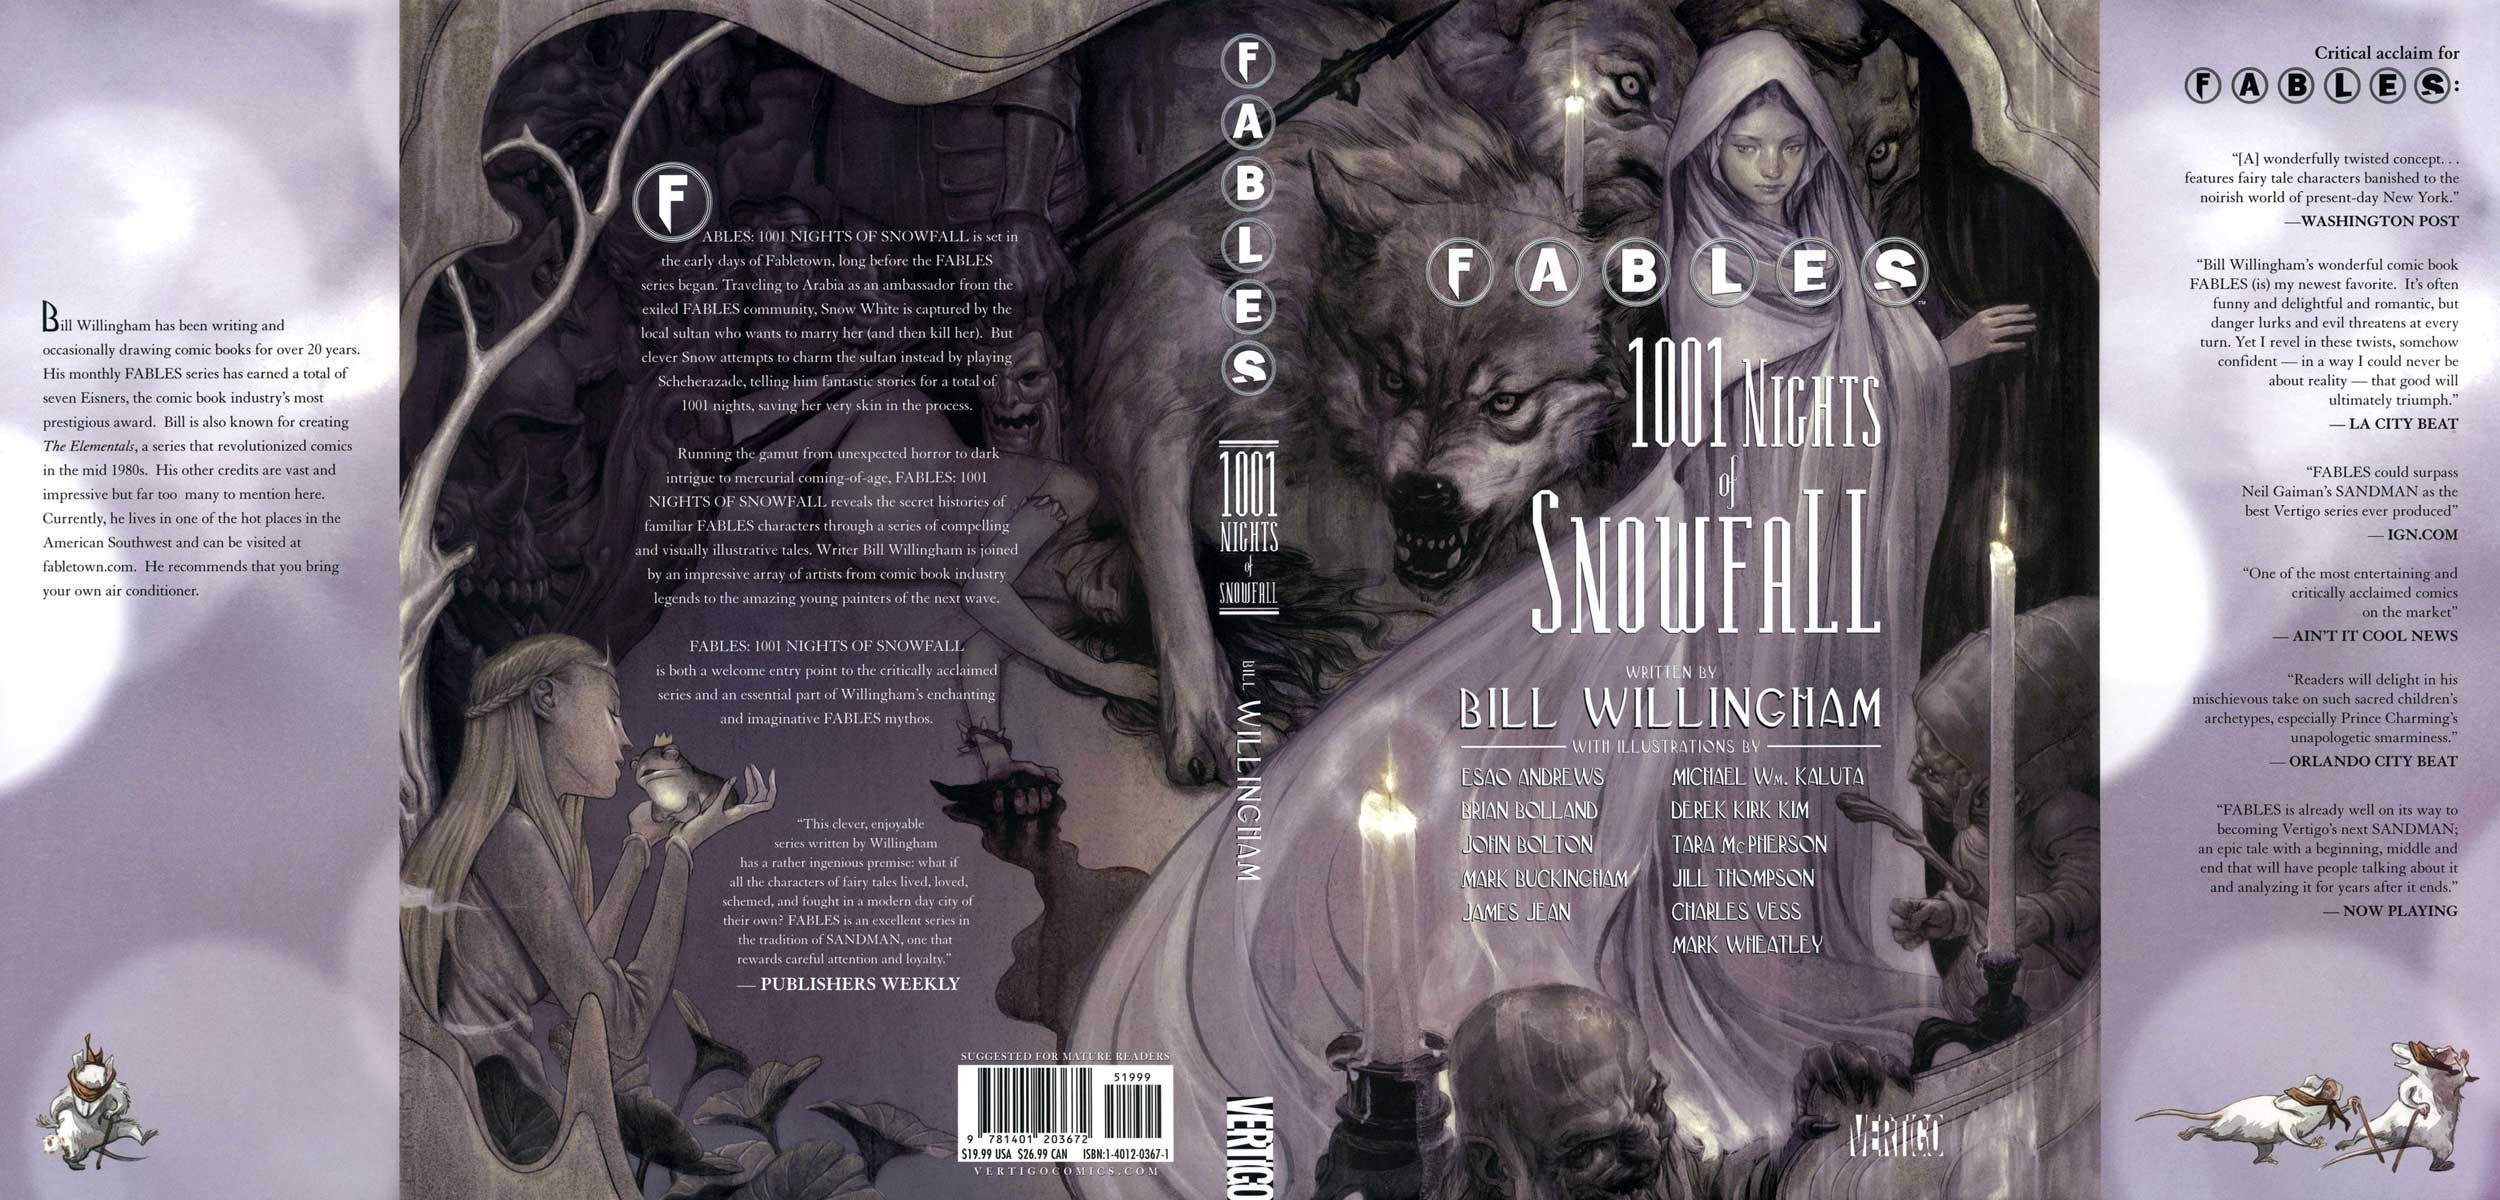 Fables - 1001 Nights of SnowFall